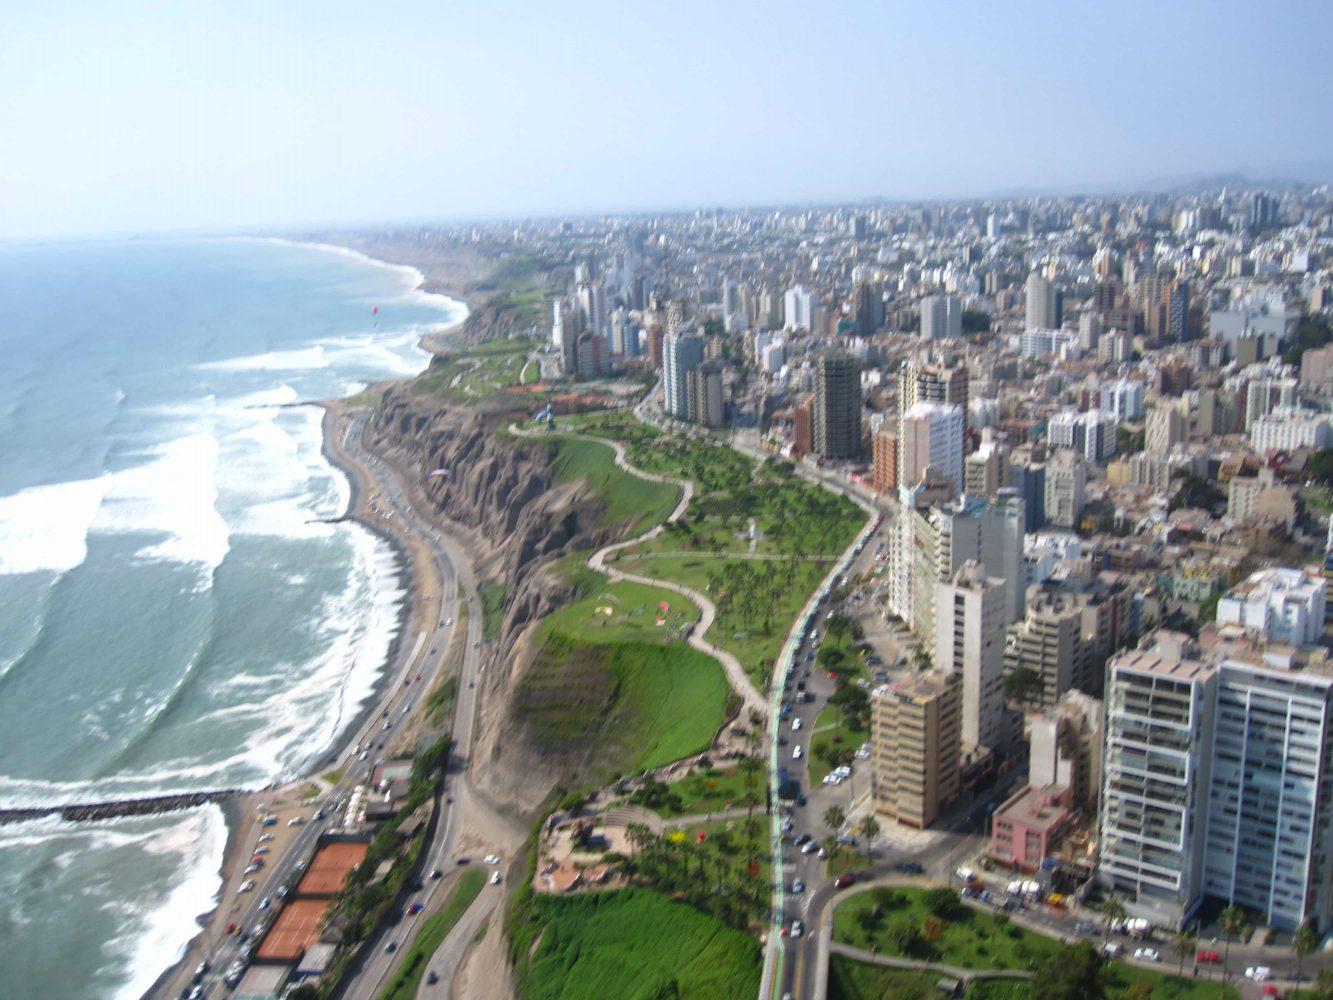 Peru IMG_0504